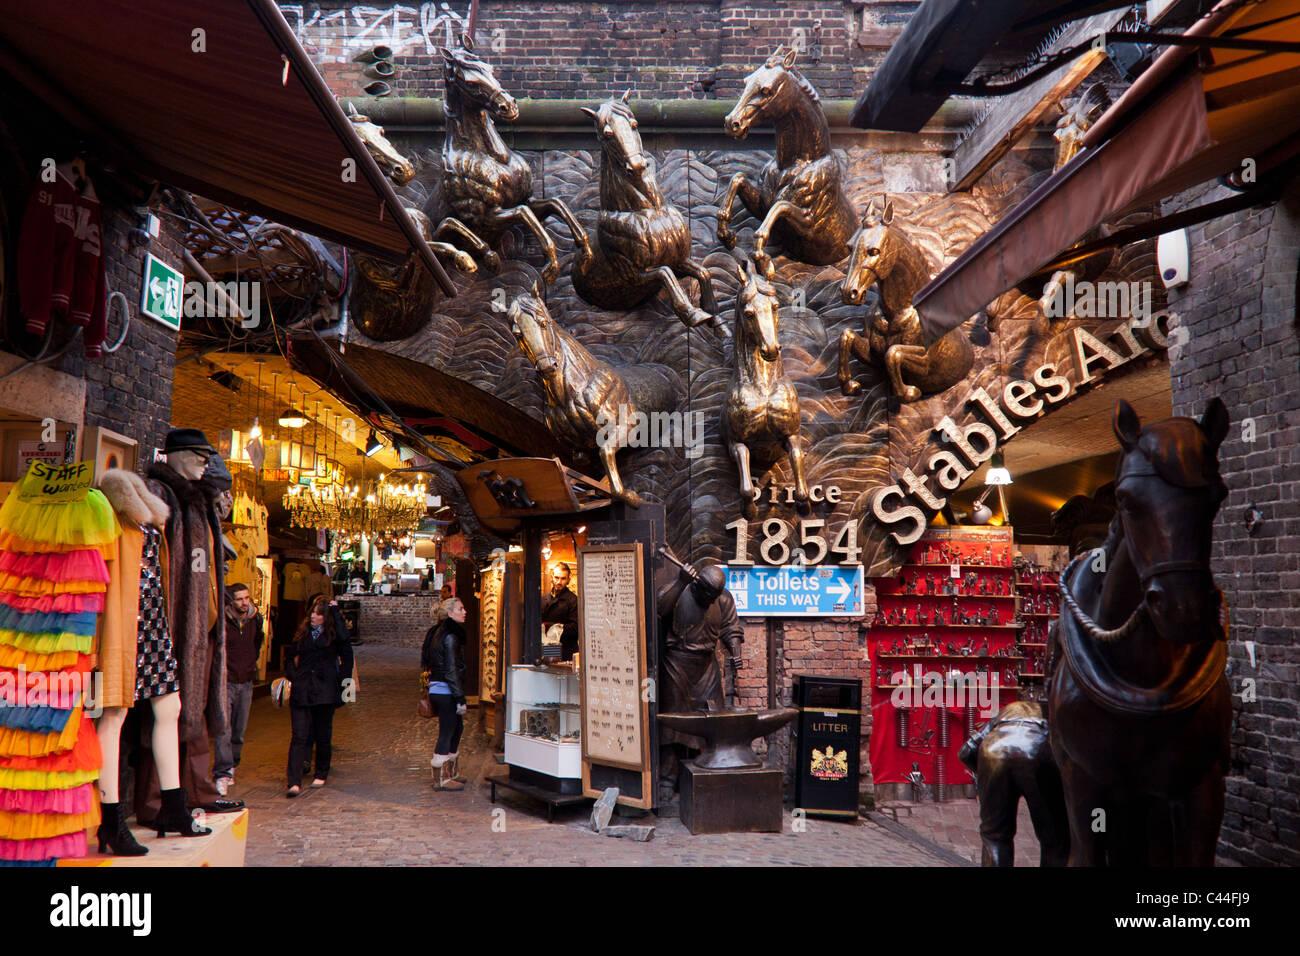 Stables Market, Camden Market - Stock Image